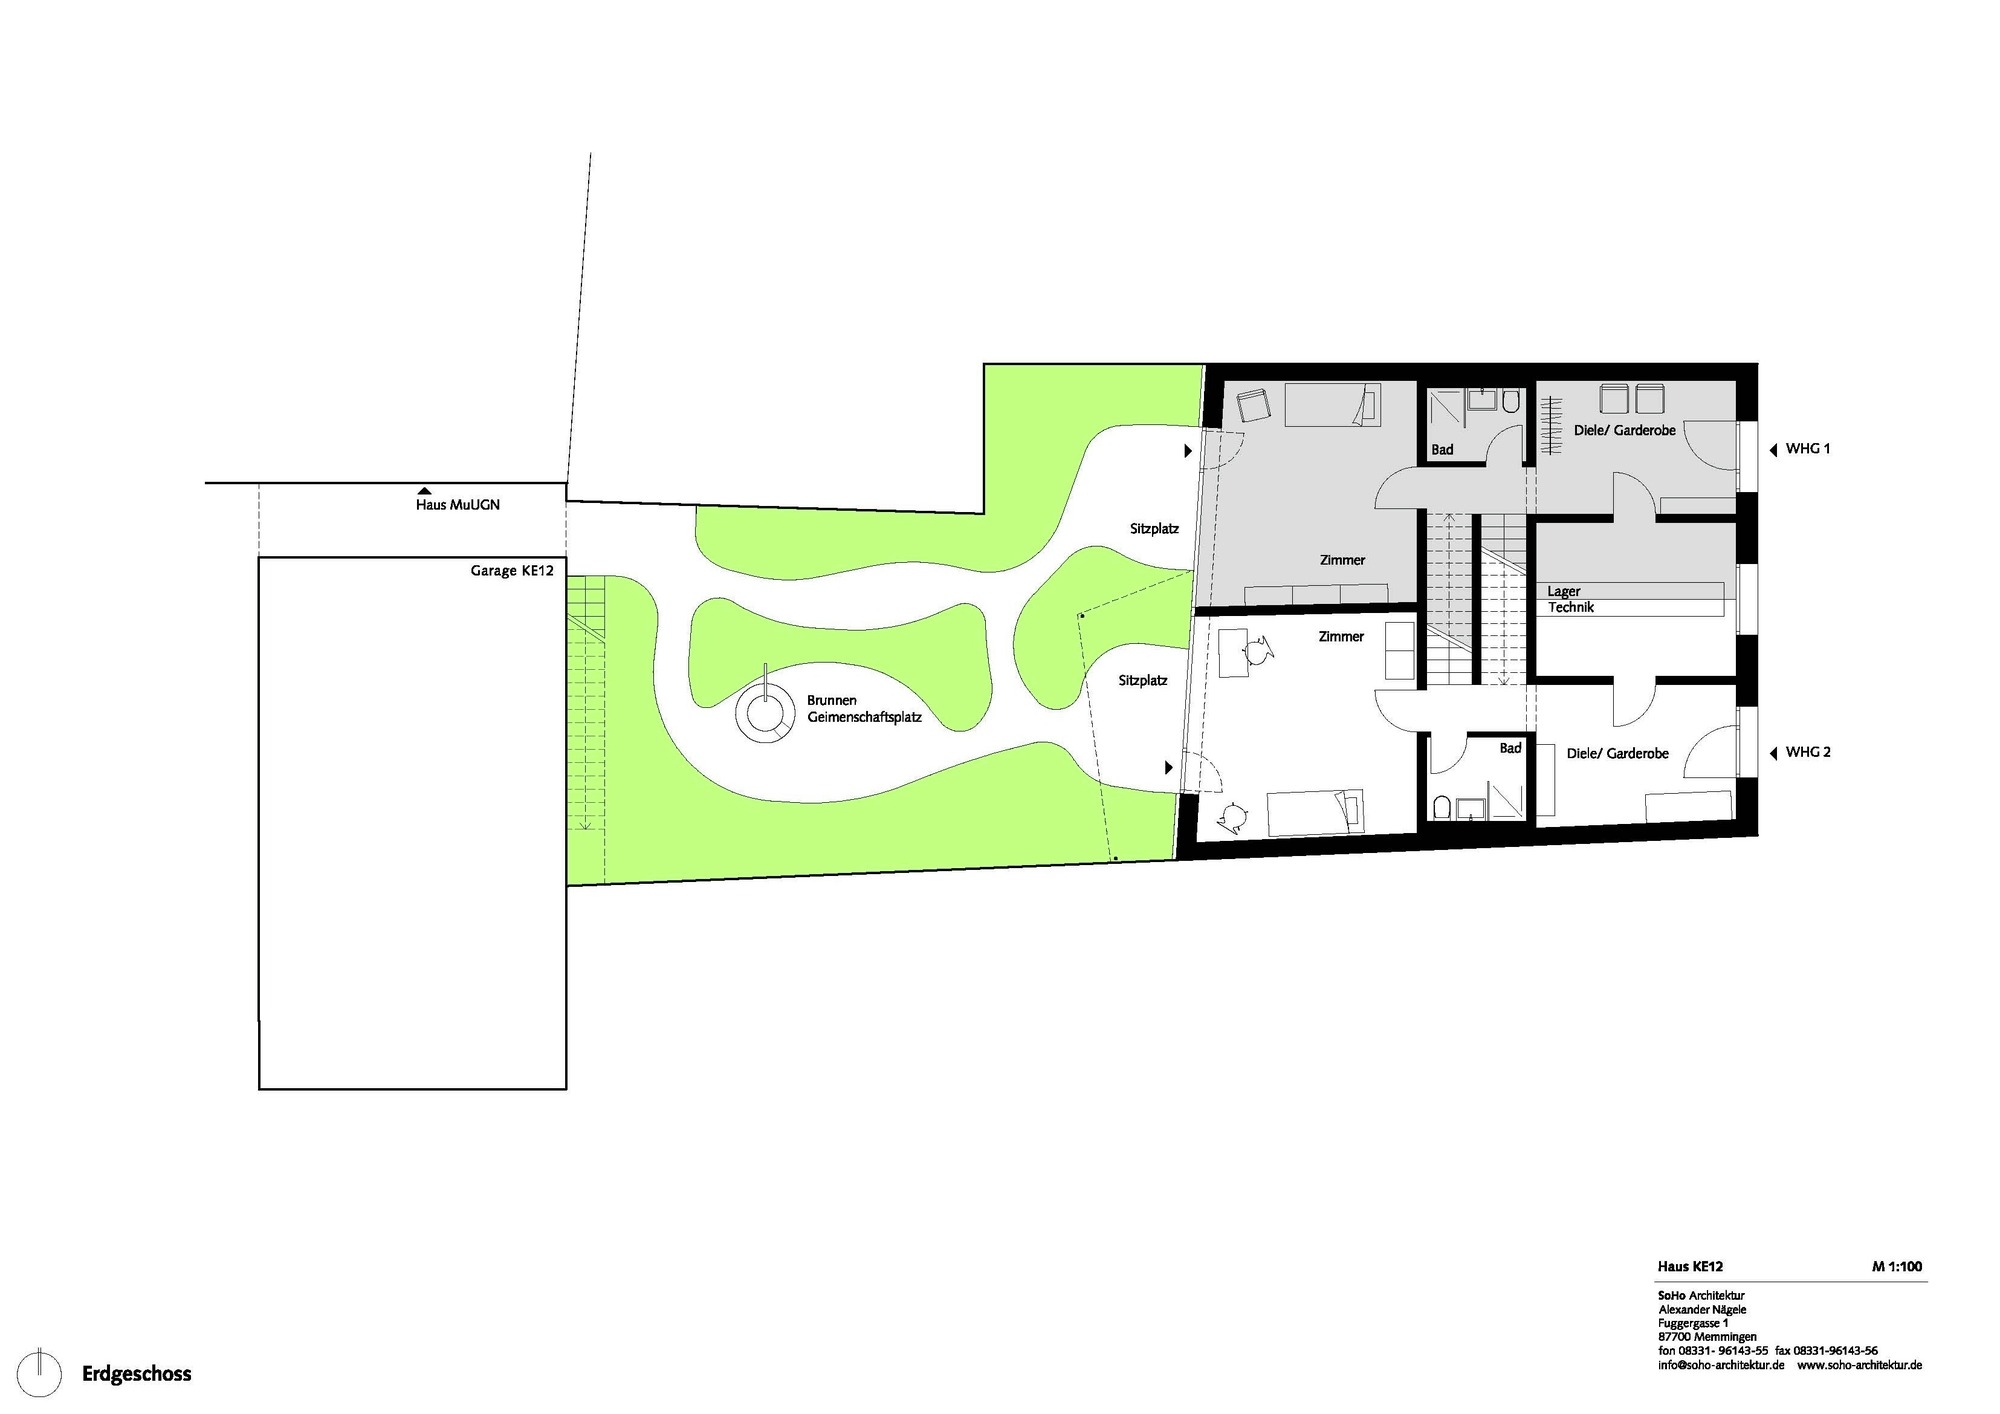 Gallery Of House Ke12 Soho Architektur 9